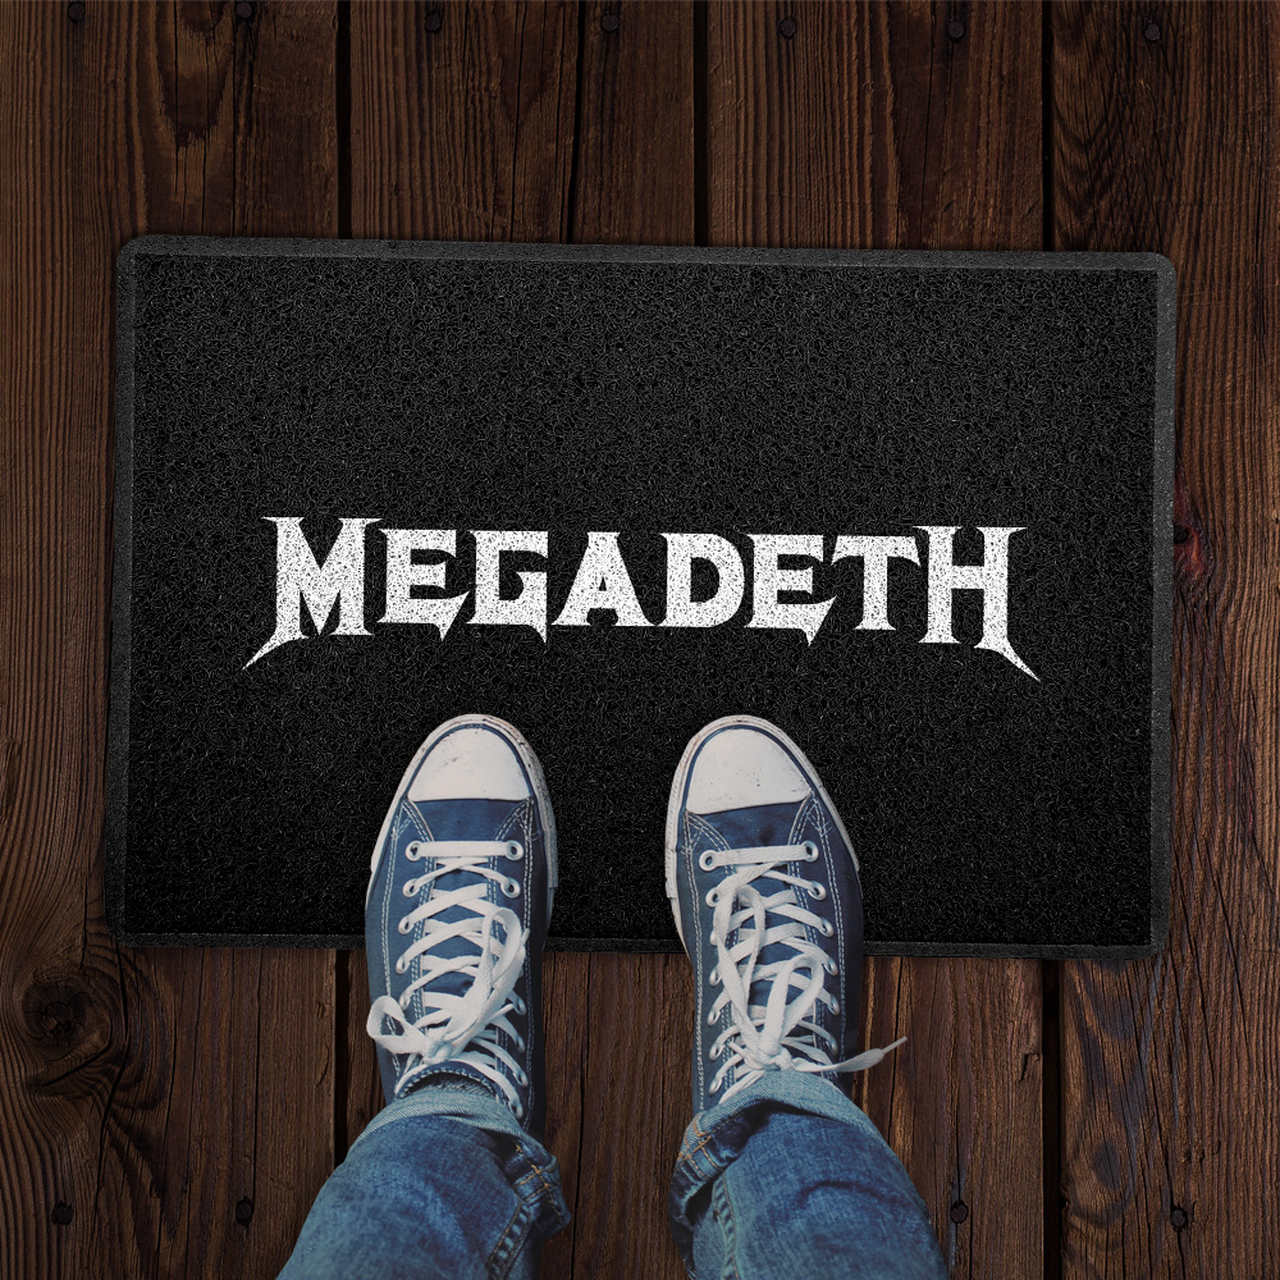 Capacho Megadeth